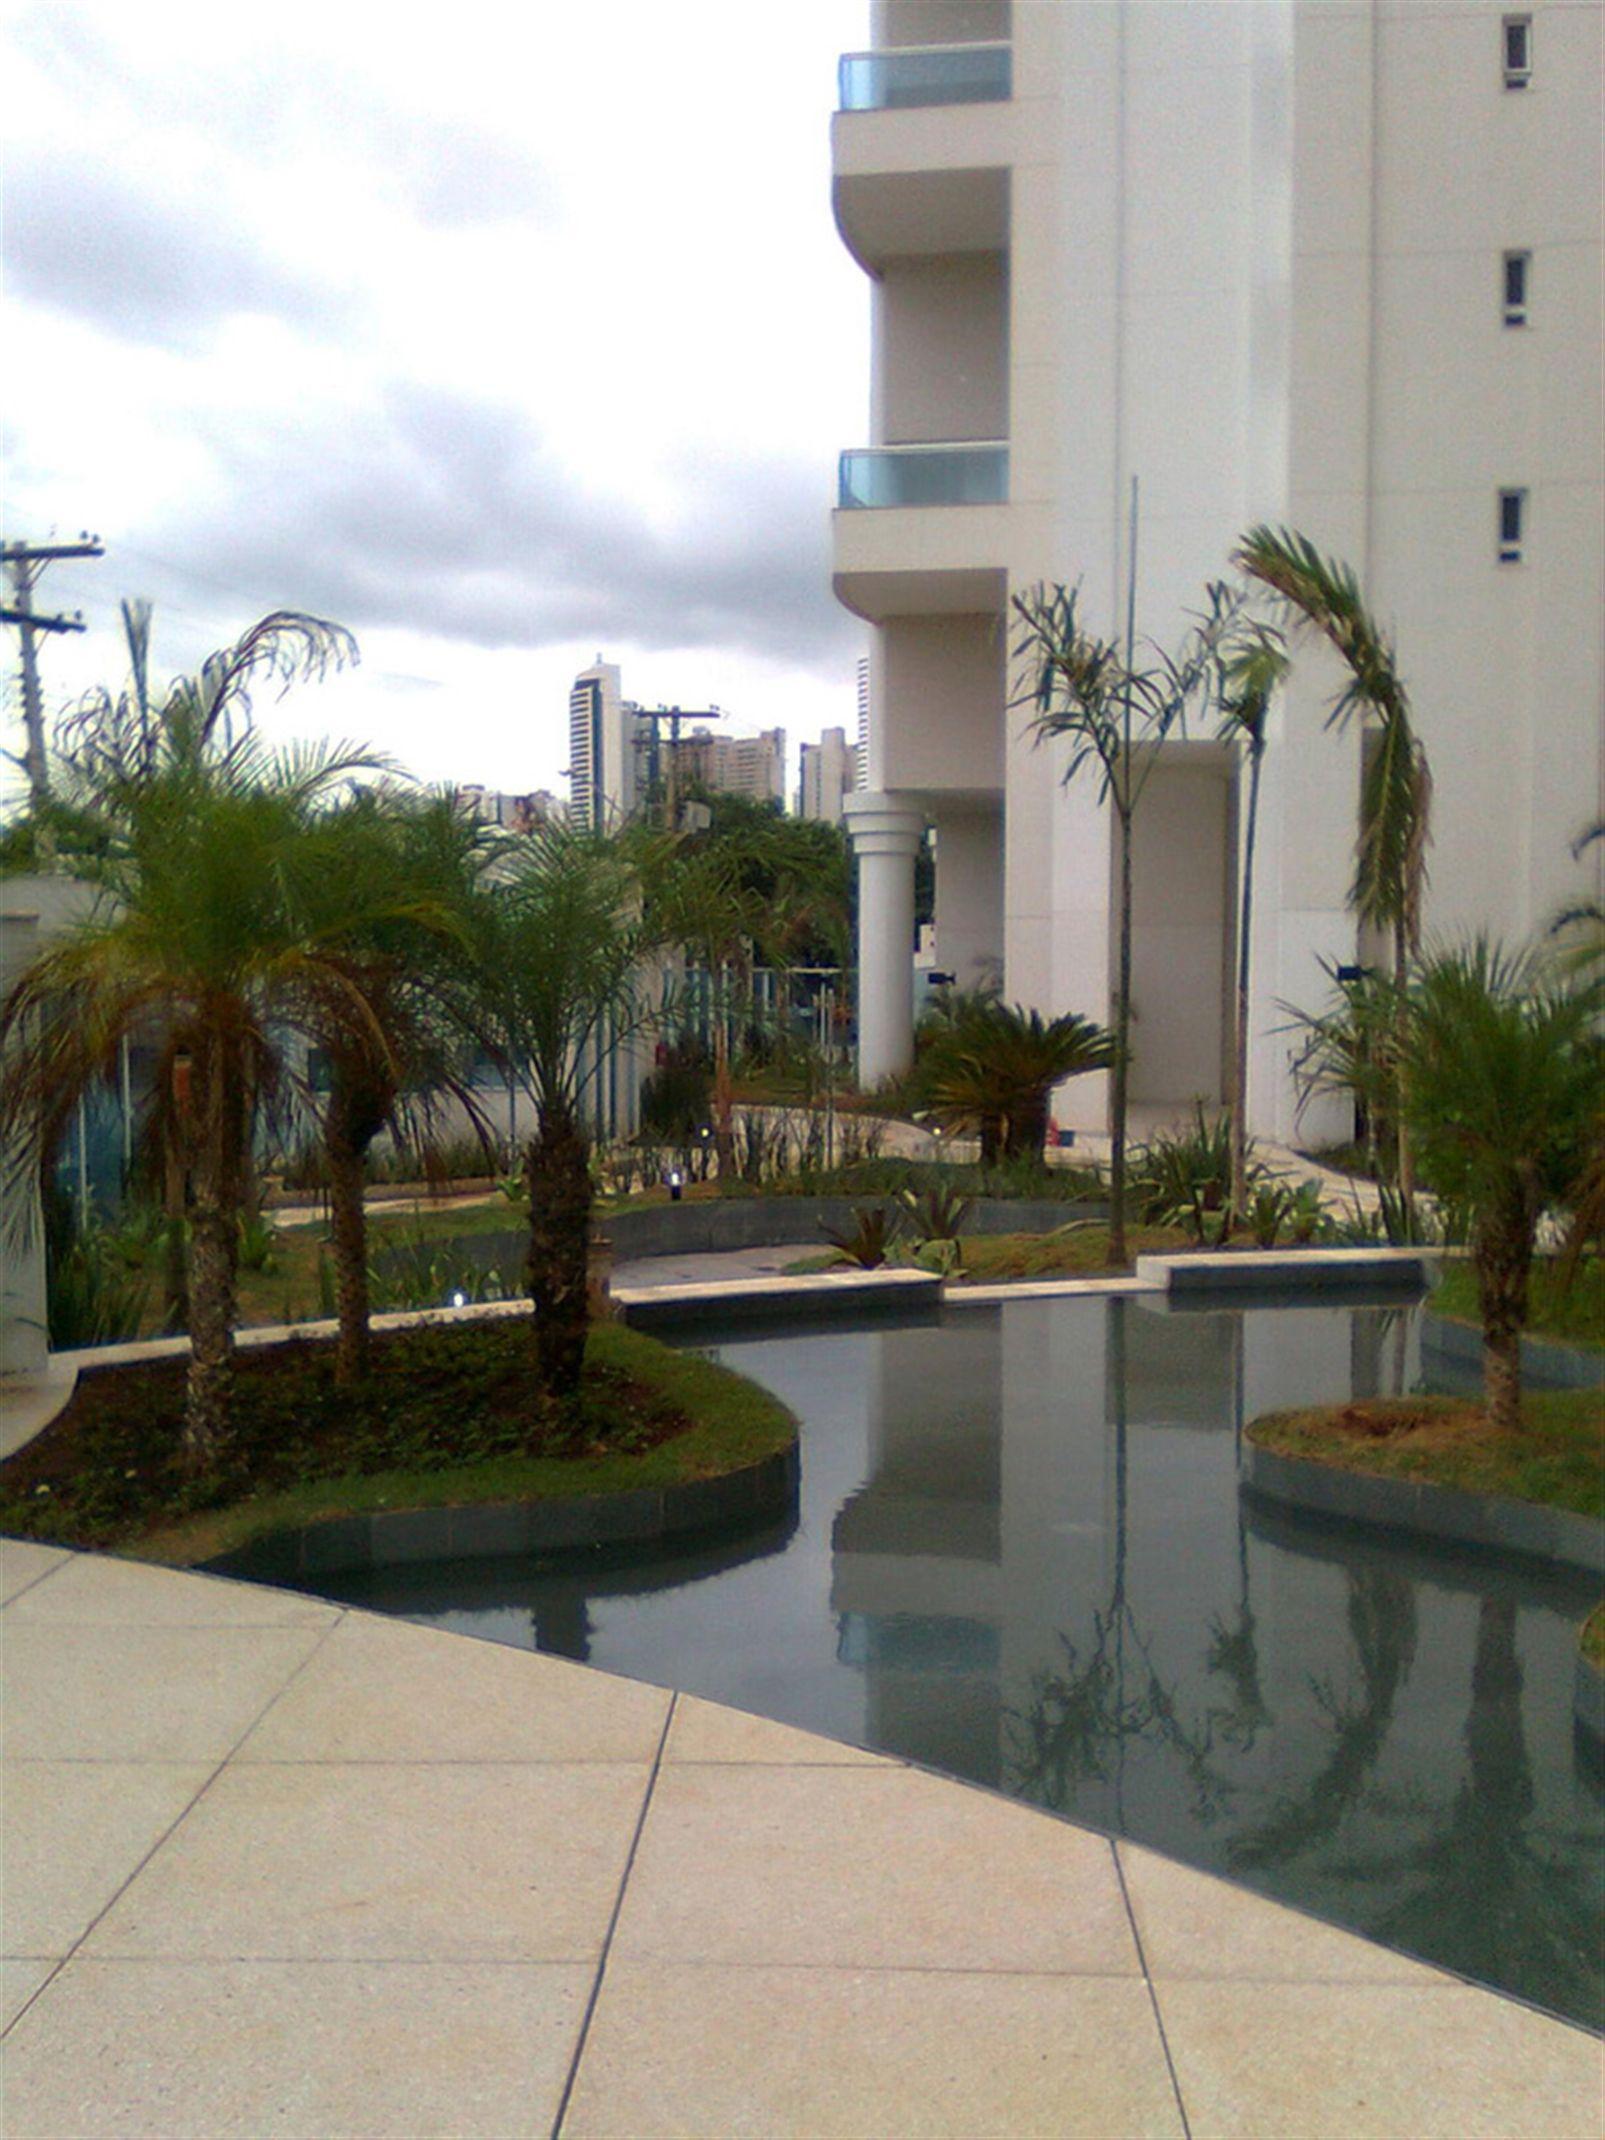 Imóvel pronto | Reserva Grann Parc – Apartamentono  Jardim Goiás - Goiânia - Goiás